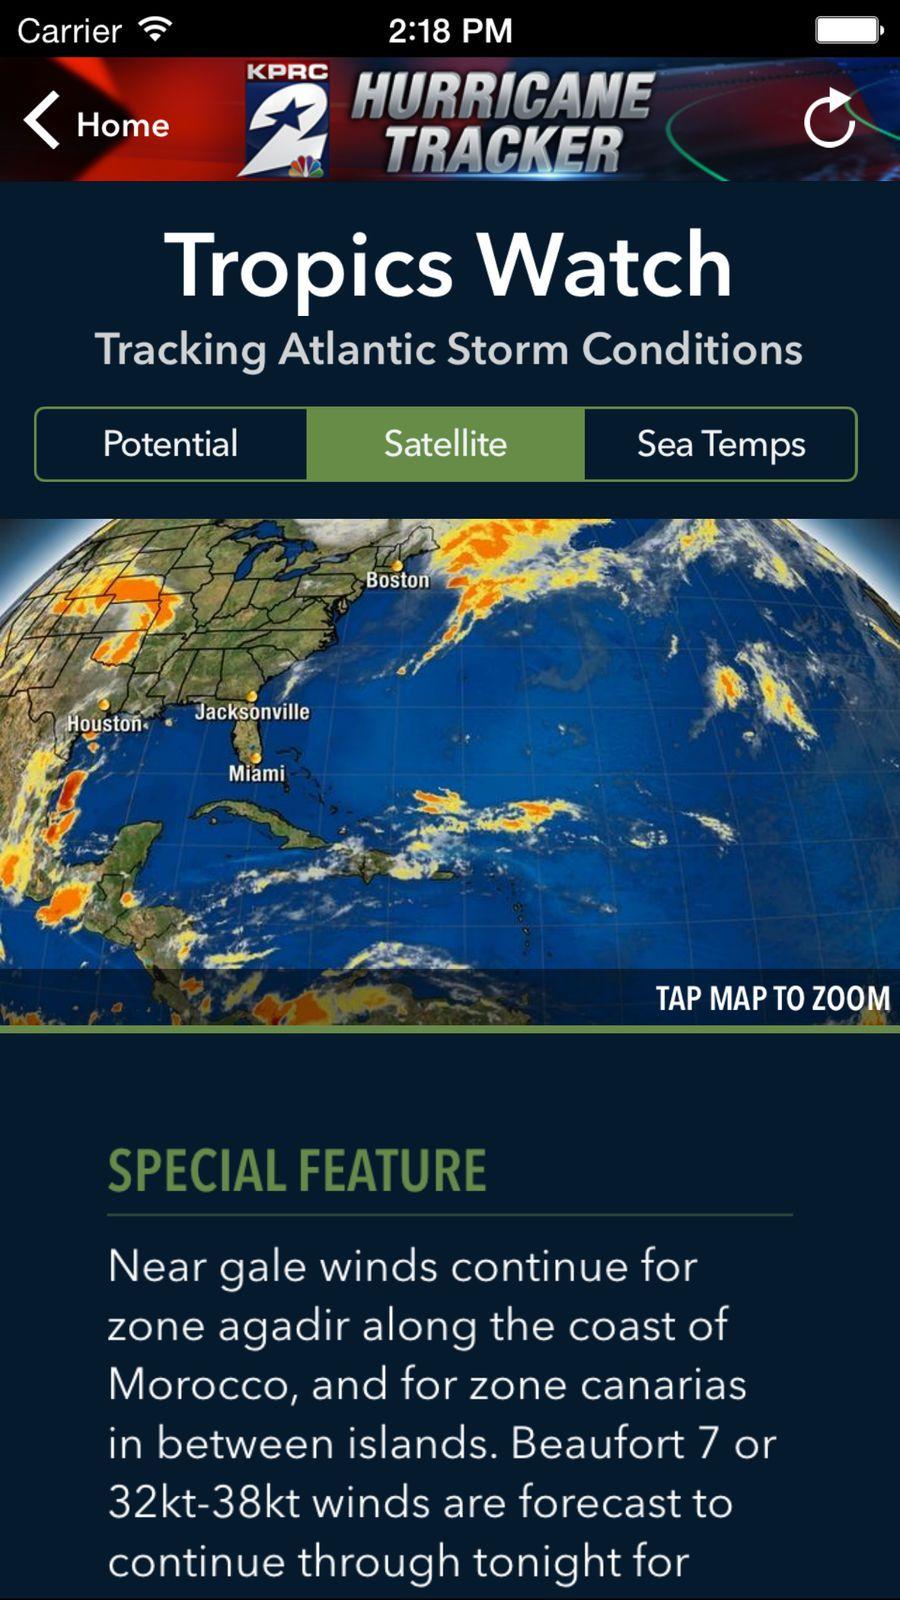 Kprc Hurricane Tracker Weather Group Ios News Hurricane Tracker Ios News